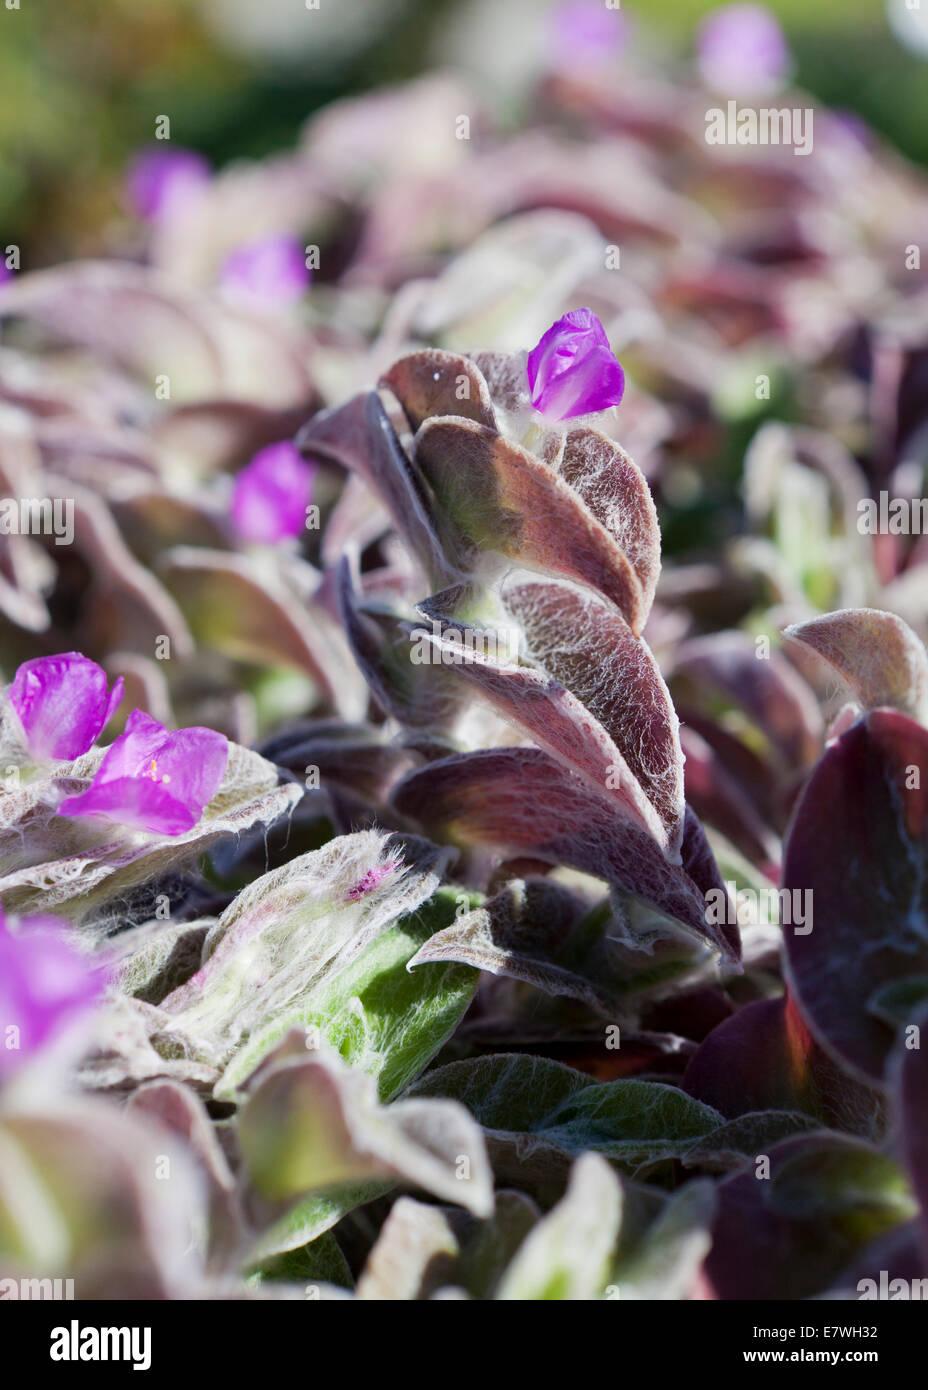 White Velvet plant, aka White Gossamer Plant, Hairy Wandering Jew, Cobweb Spiderwort (Tradescantia sillamontana) - Stock Image